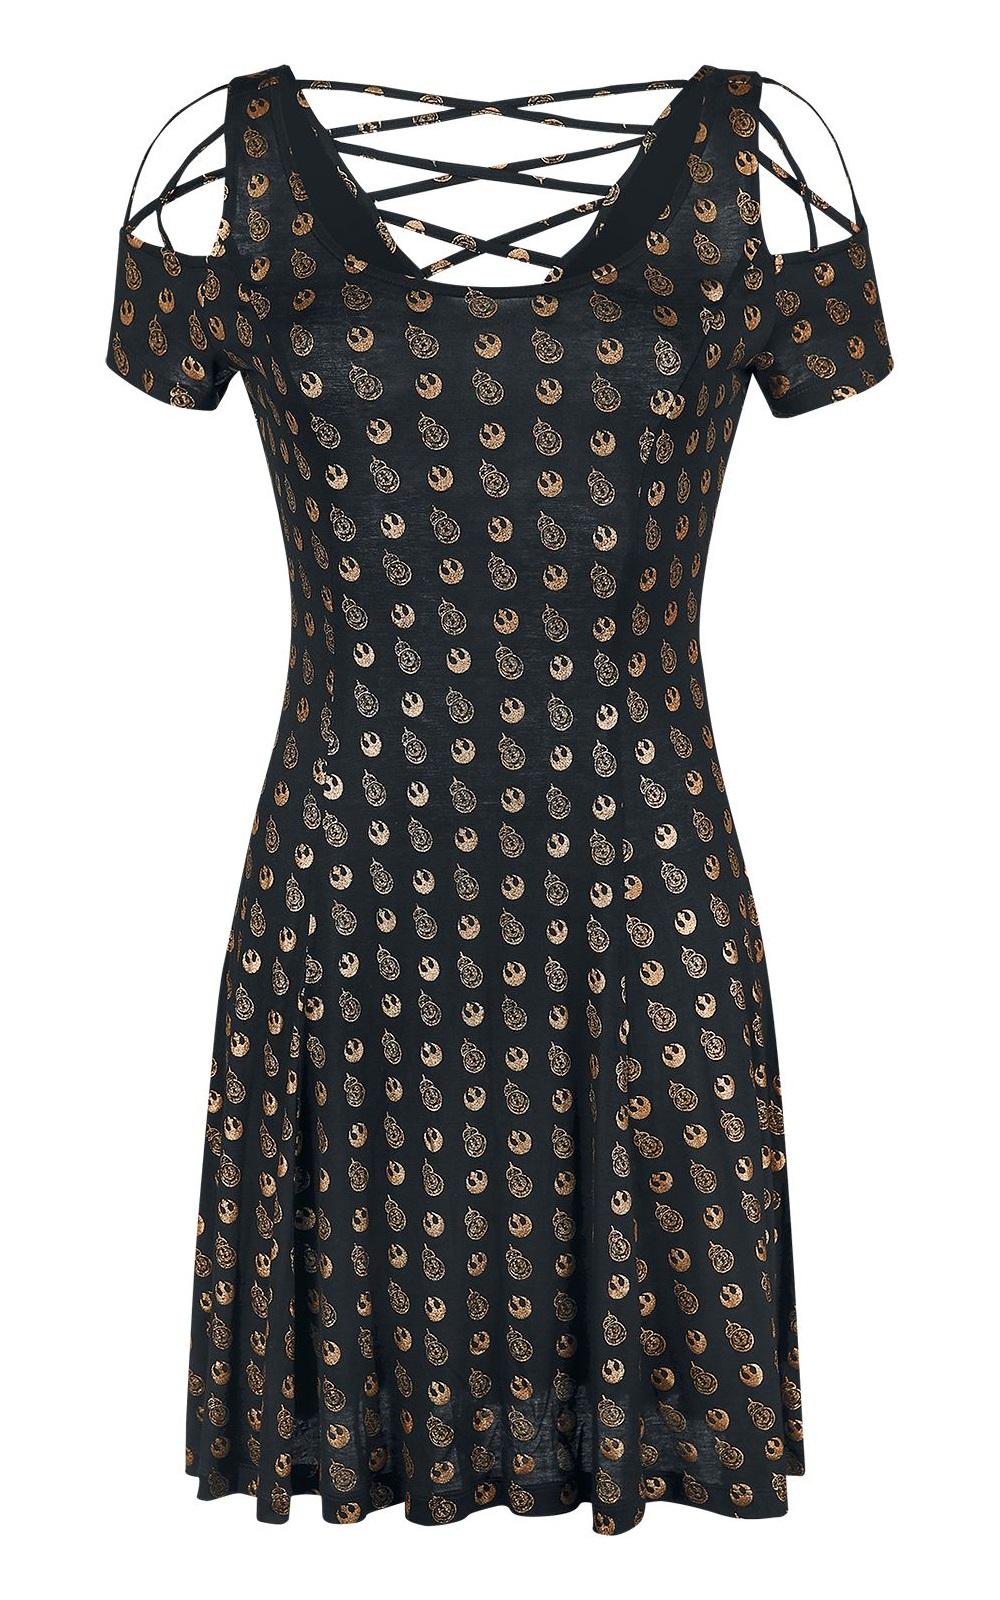 Women's Star Wars BB-8 Metallic Gold All Over Print Dress at EMP Online